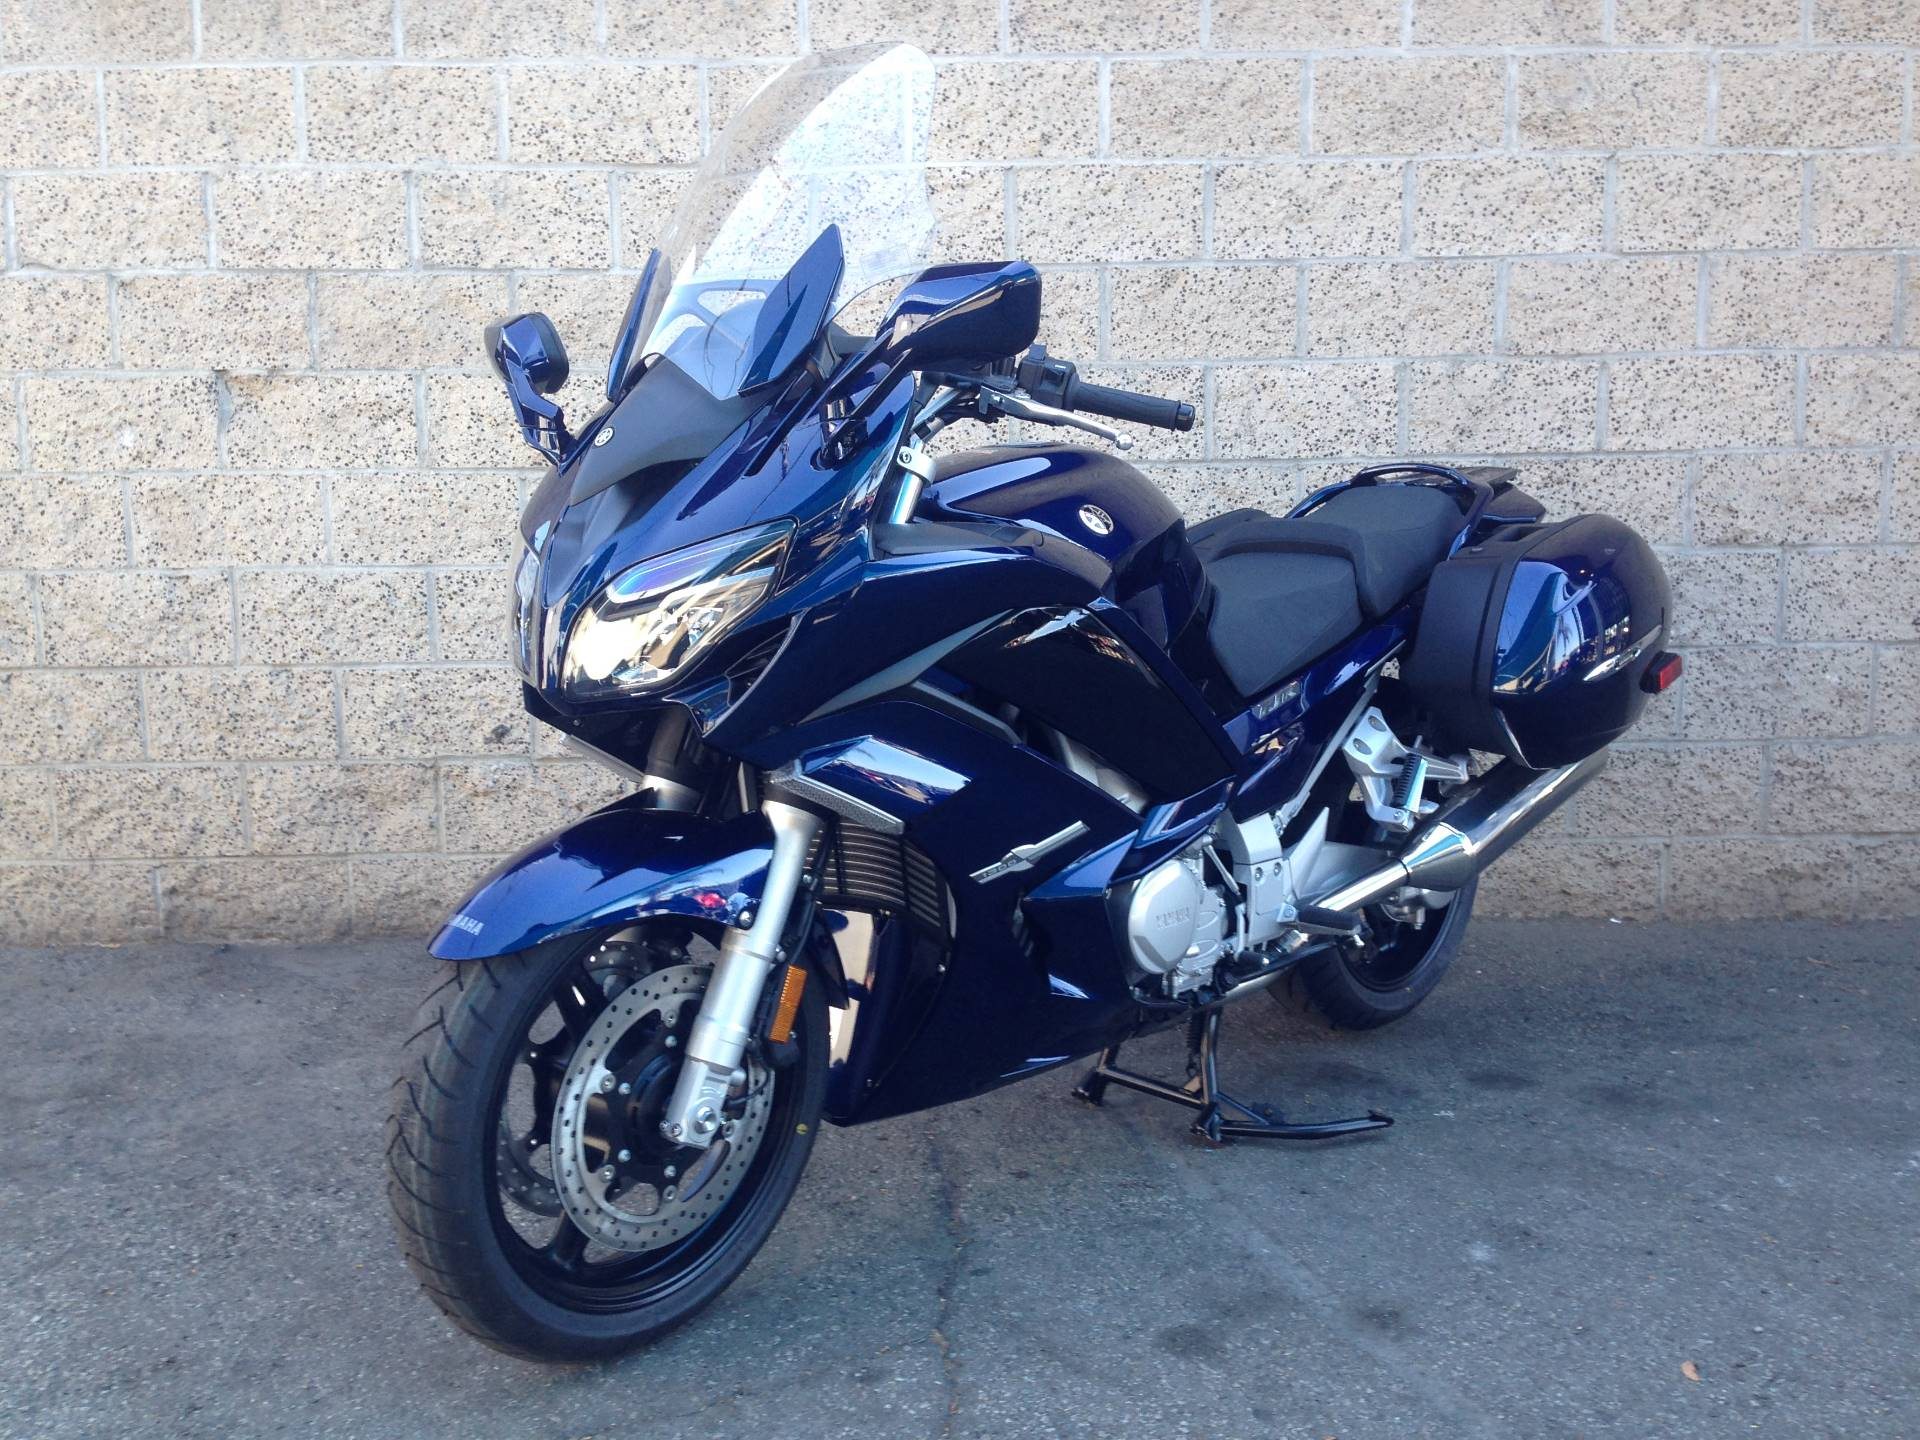 2016 Yamaha FJR1300A 3